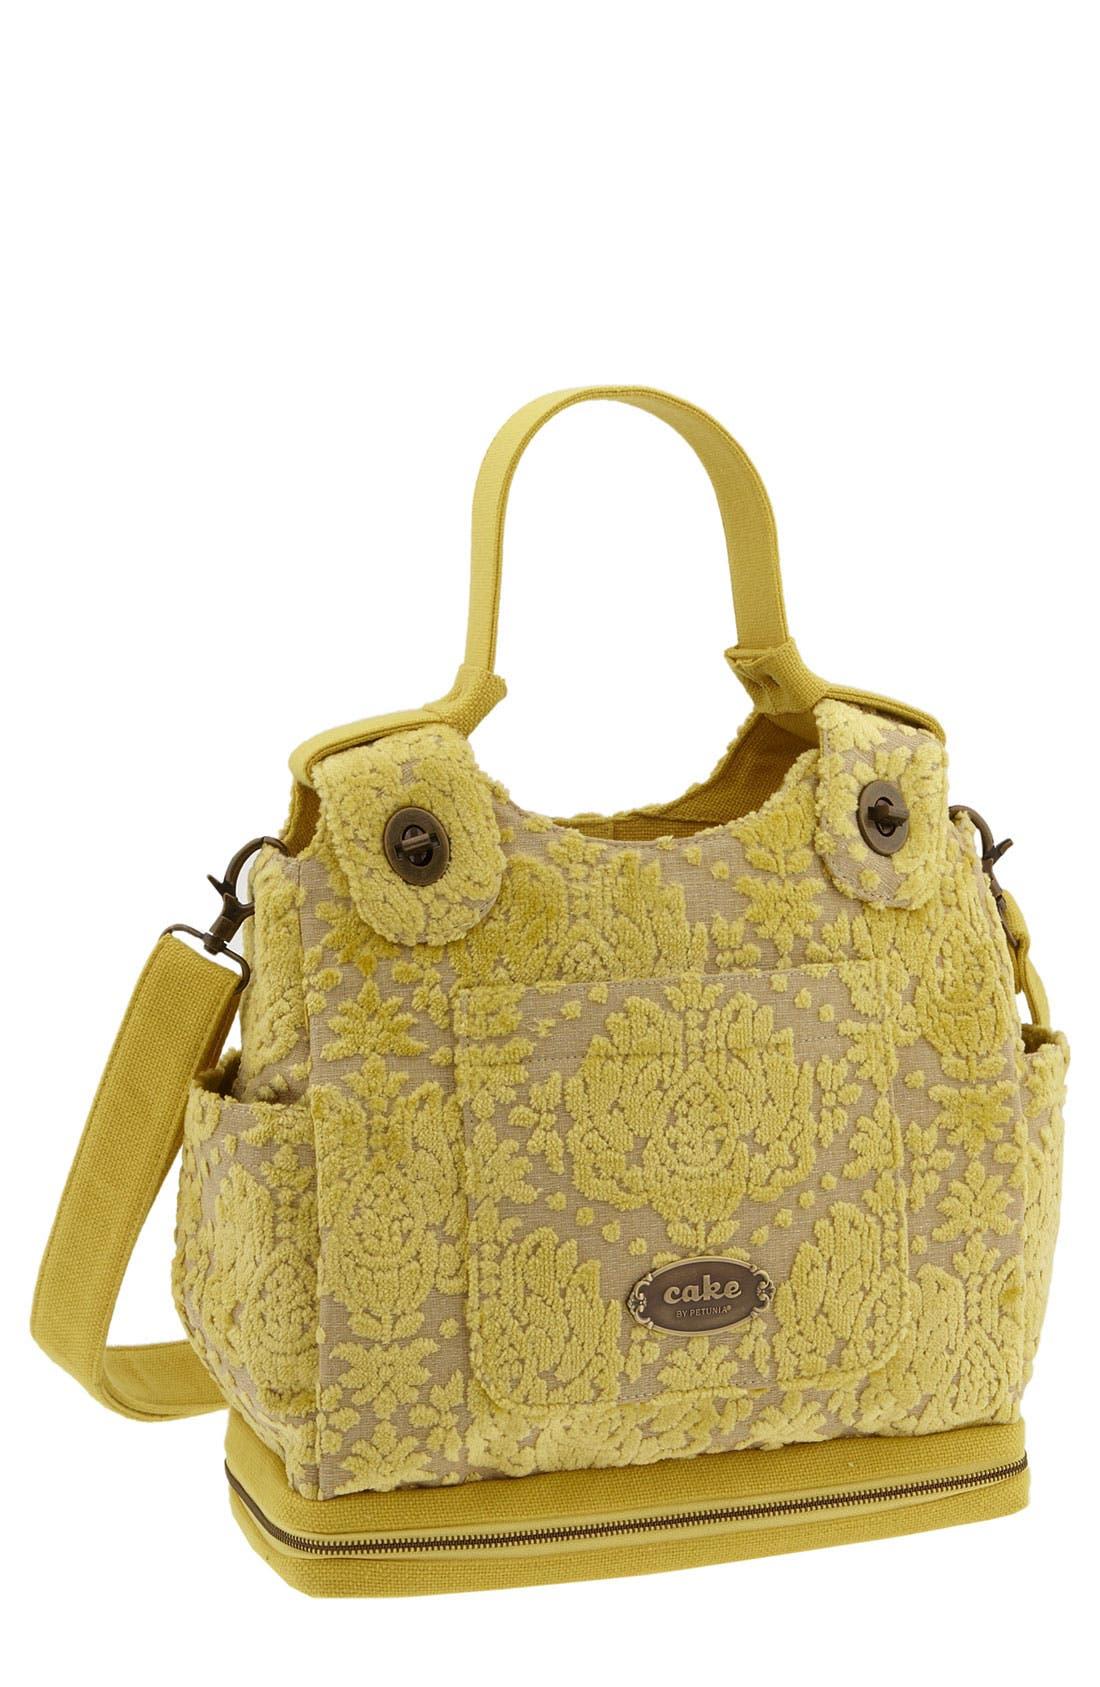 Alternate Image 1 Selected - Petunia Pickle Bottom 'Cake Society' Convertible Baby Bag